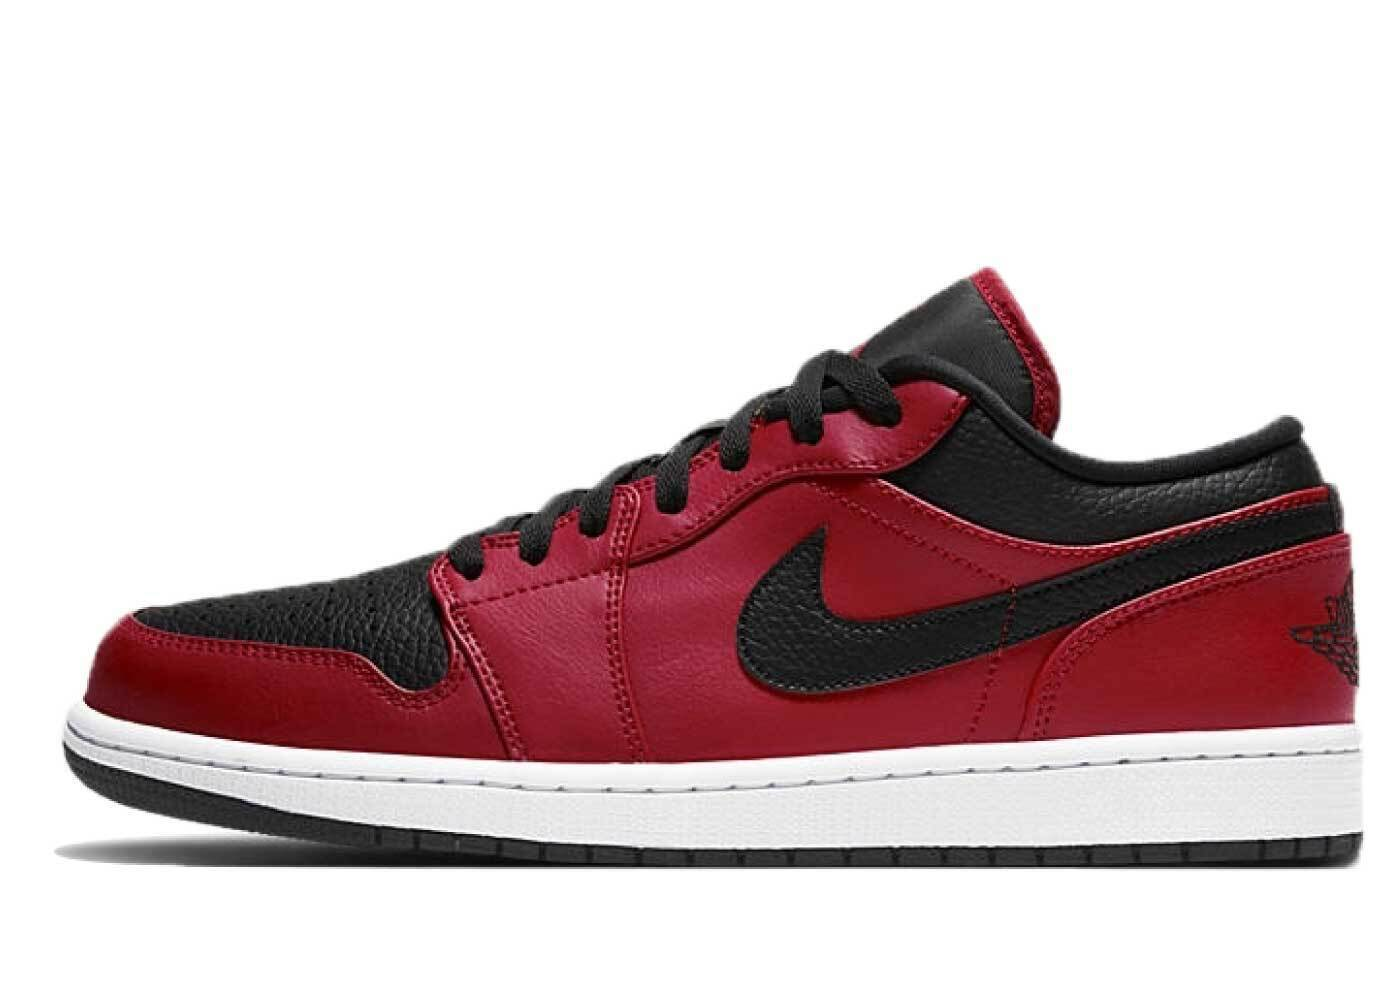 Nike Air Jordan 1 Low Gym Red Blackの写真